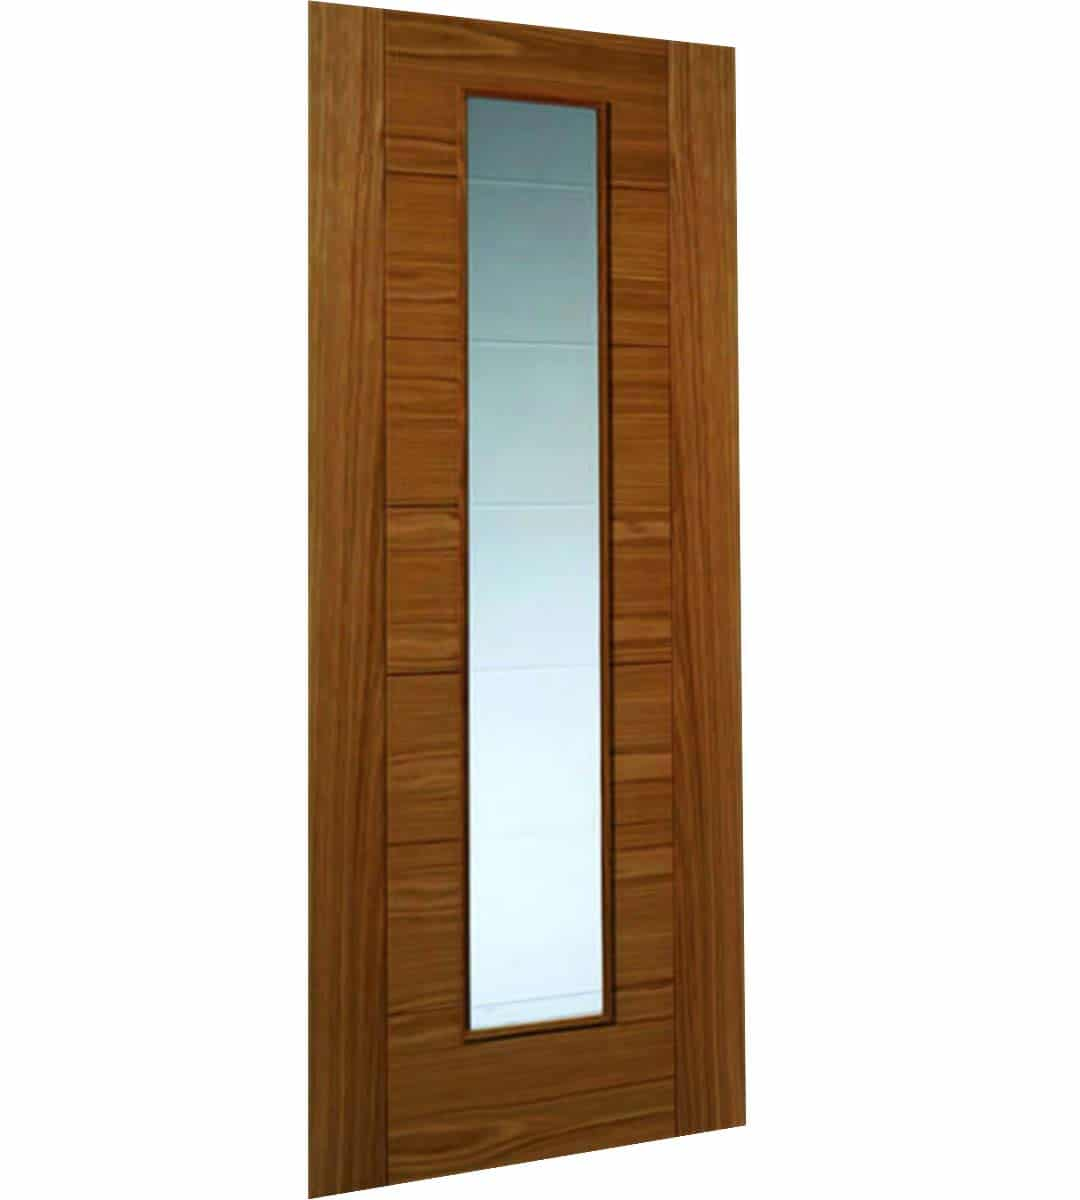 Royale Modern VP7 Glazed Interior Door